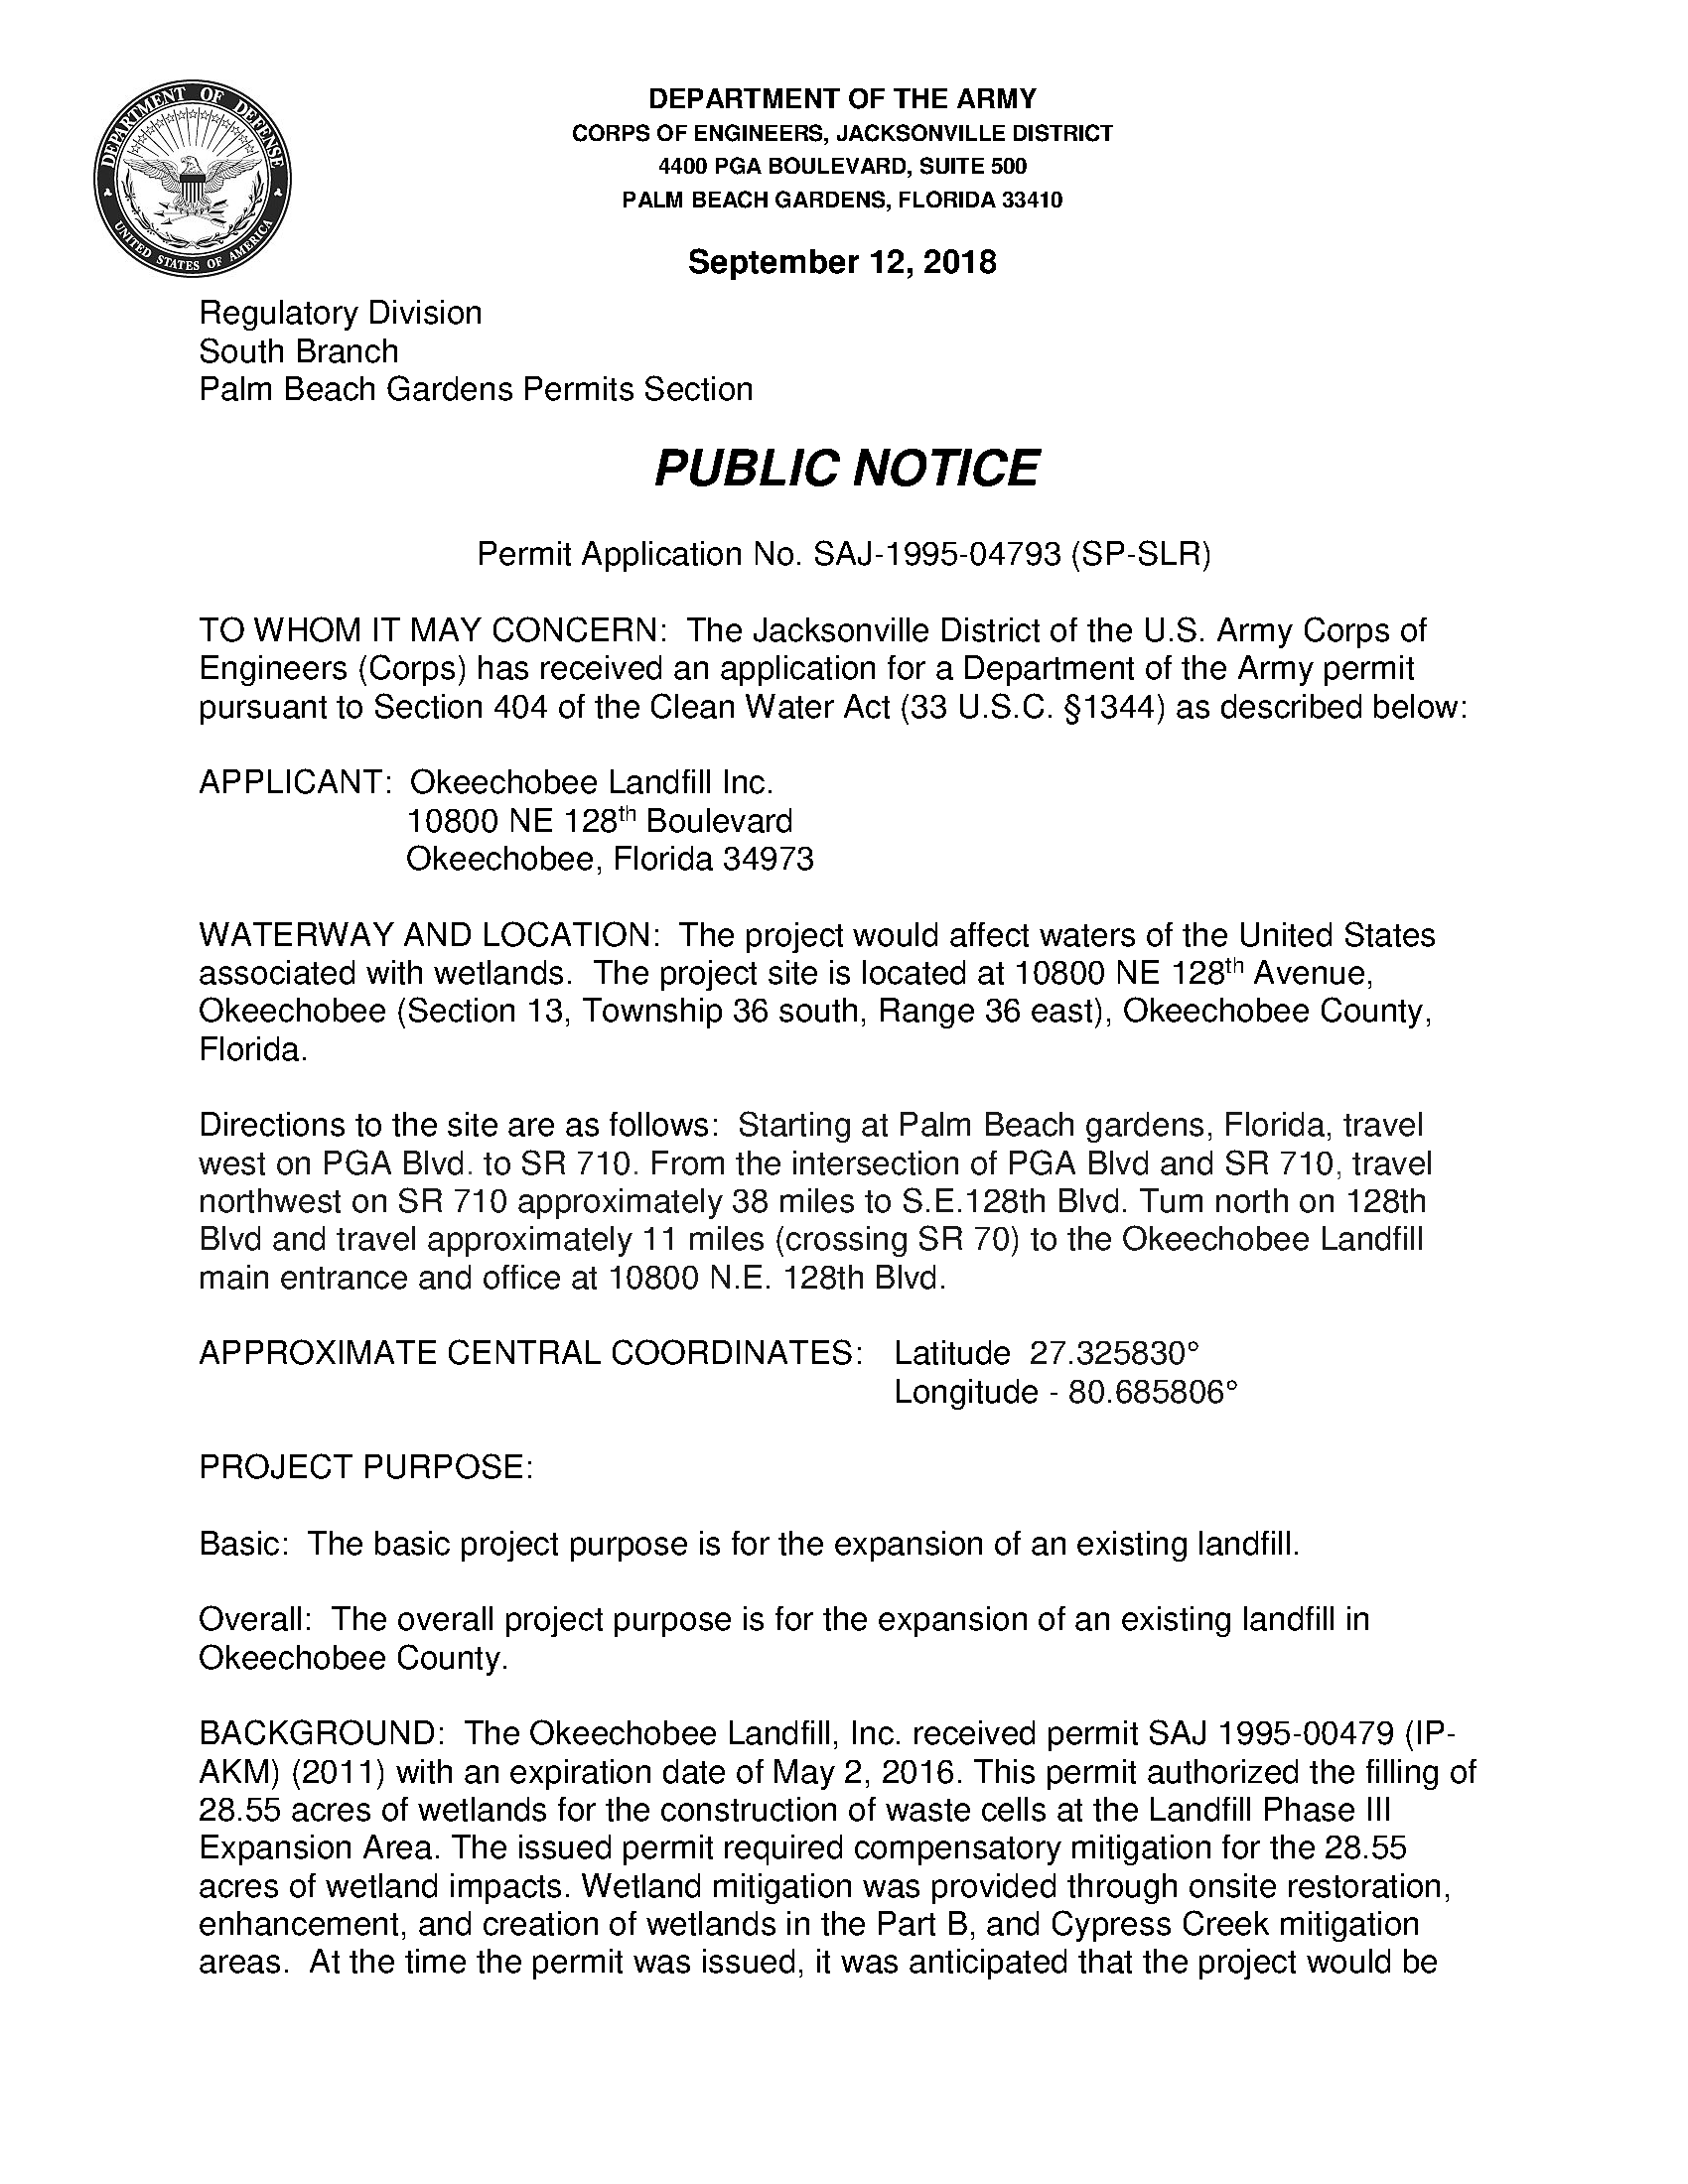 Public notice: Permit application no  SAJ-1995-04793 (SP-SLR